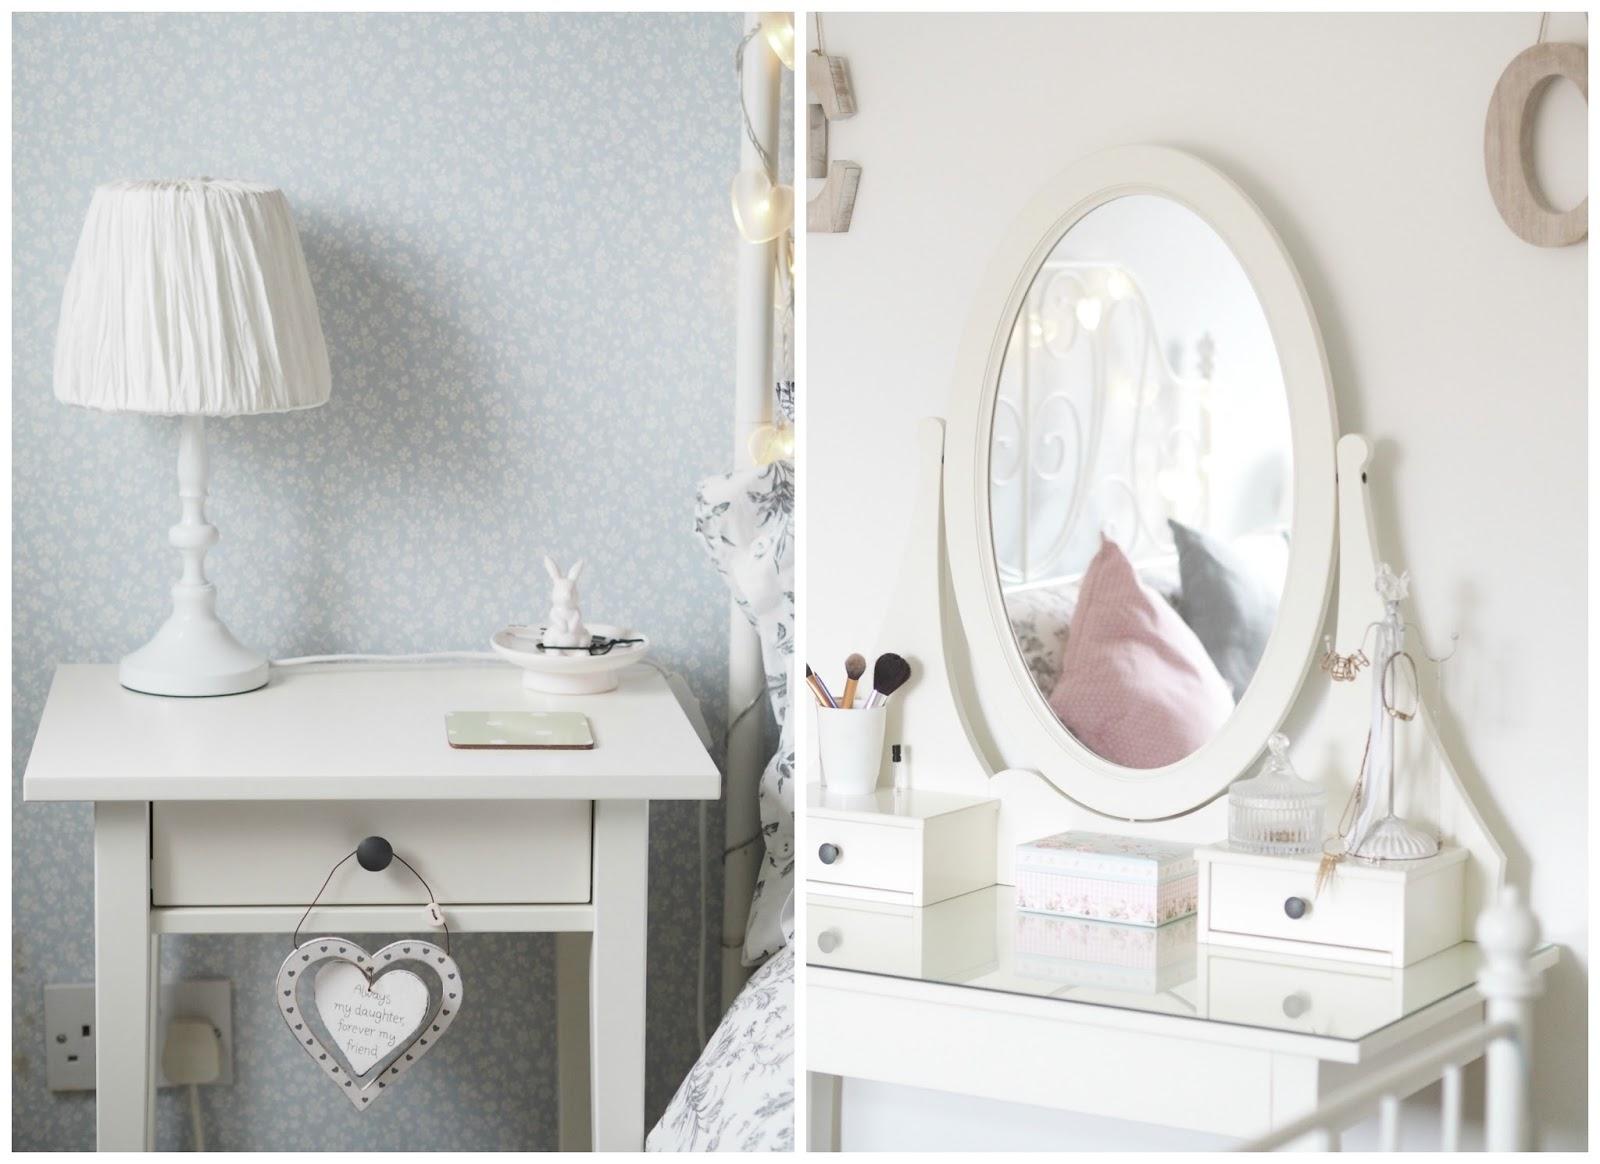 Leicester interior design vintage bedroom makeover Priceless Life of Mine over 40 lifestyle blog